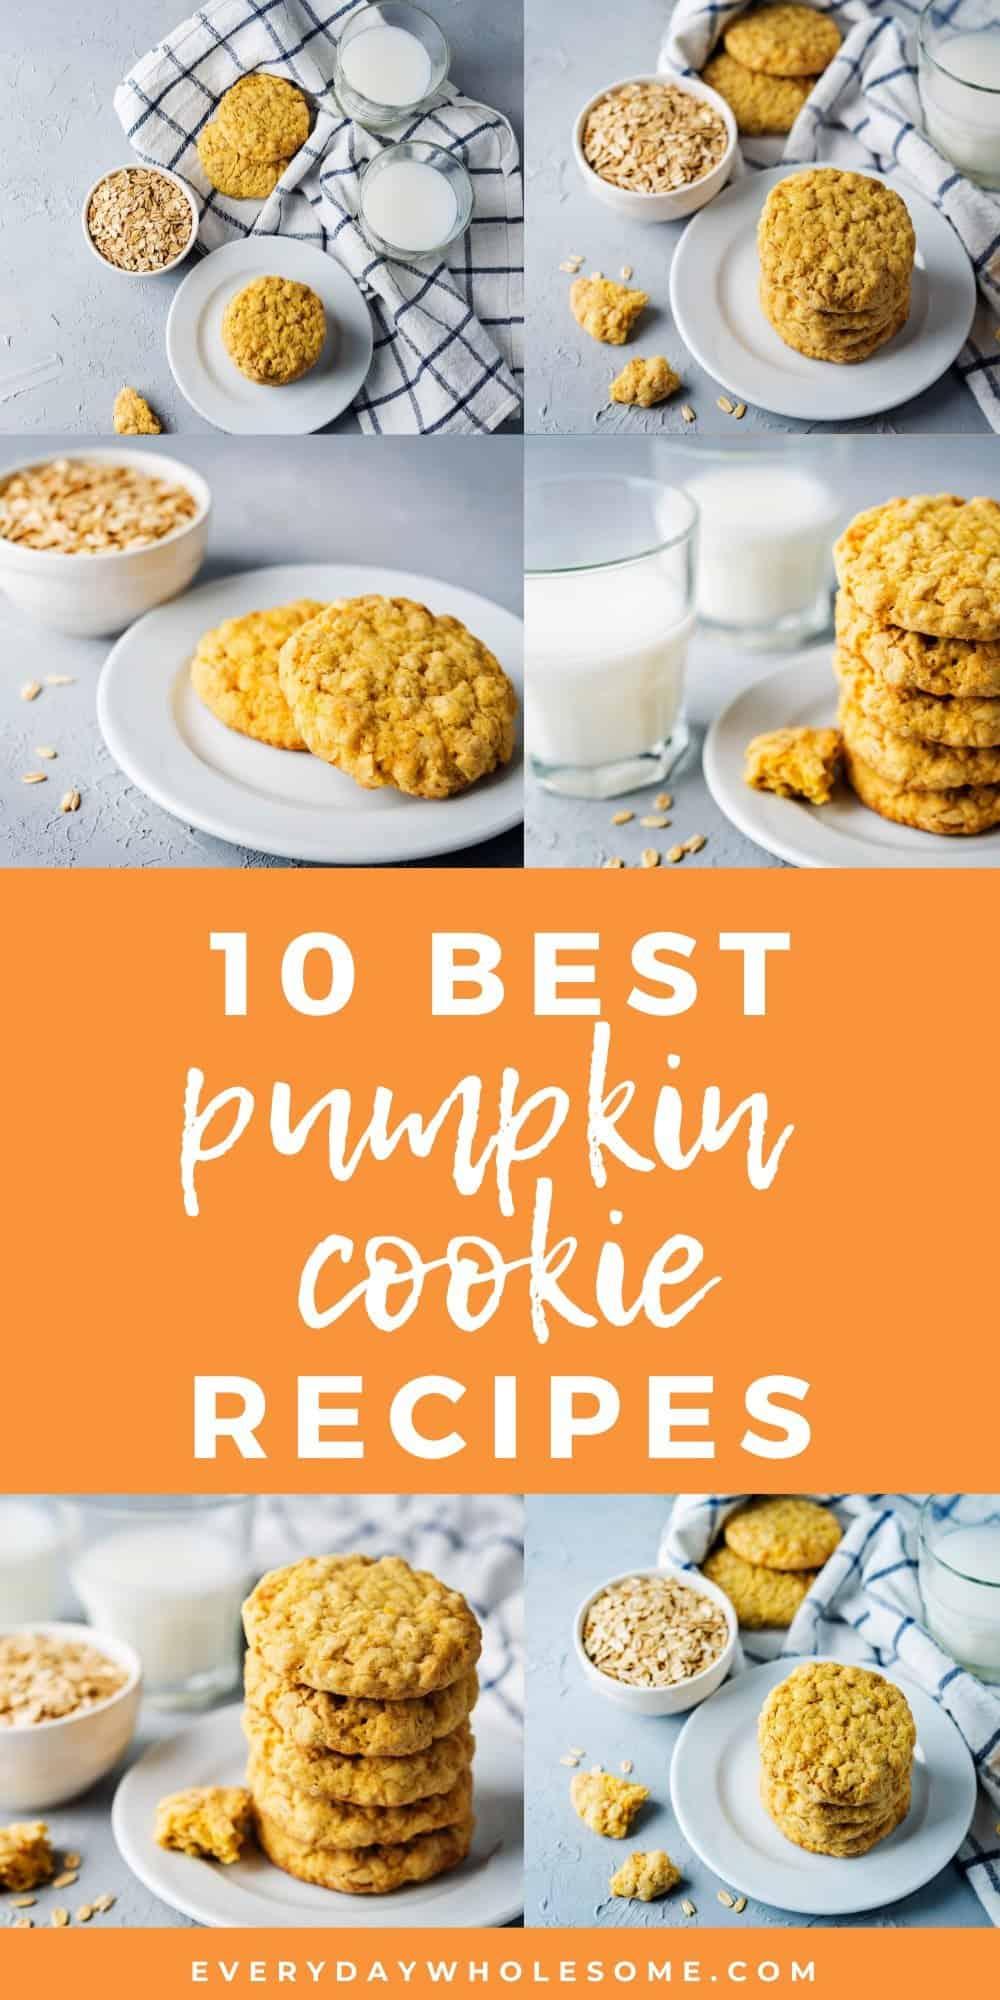 10 best pumpkin cookie oatmeal recipes